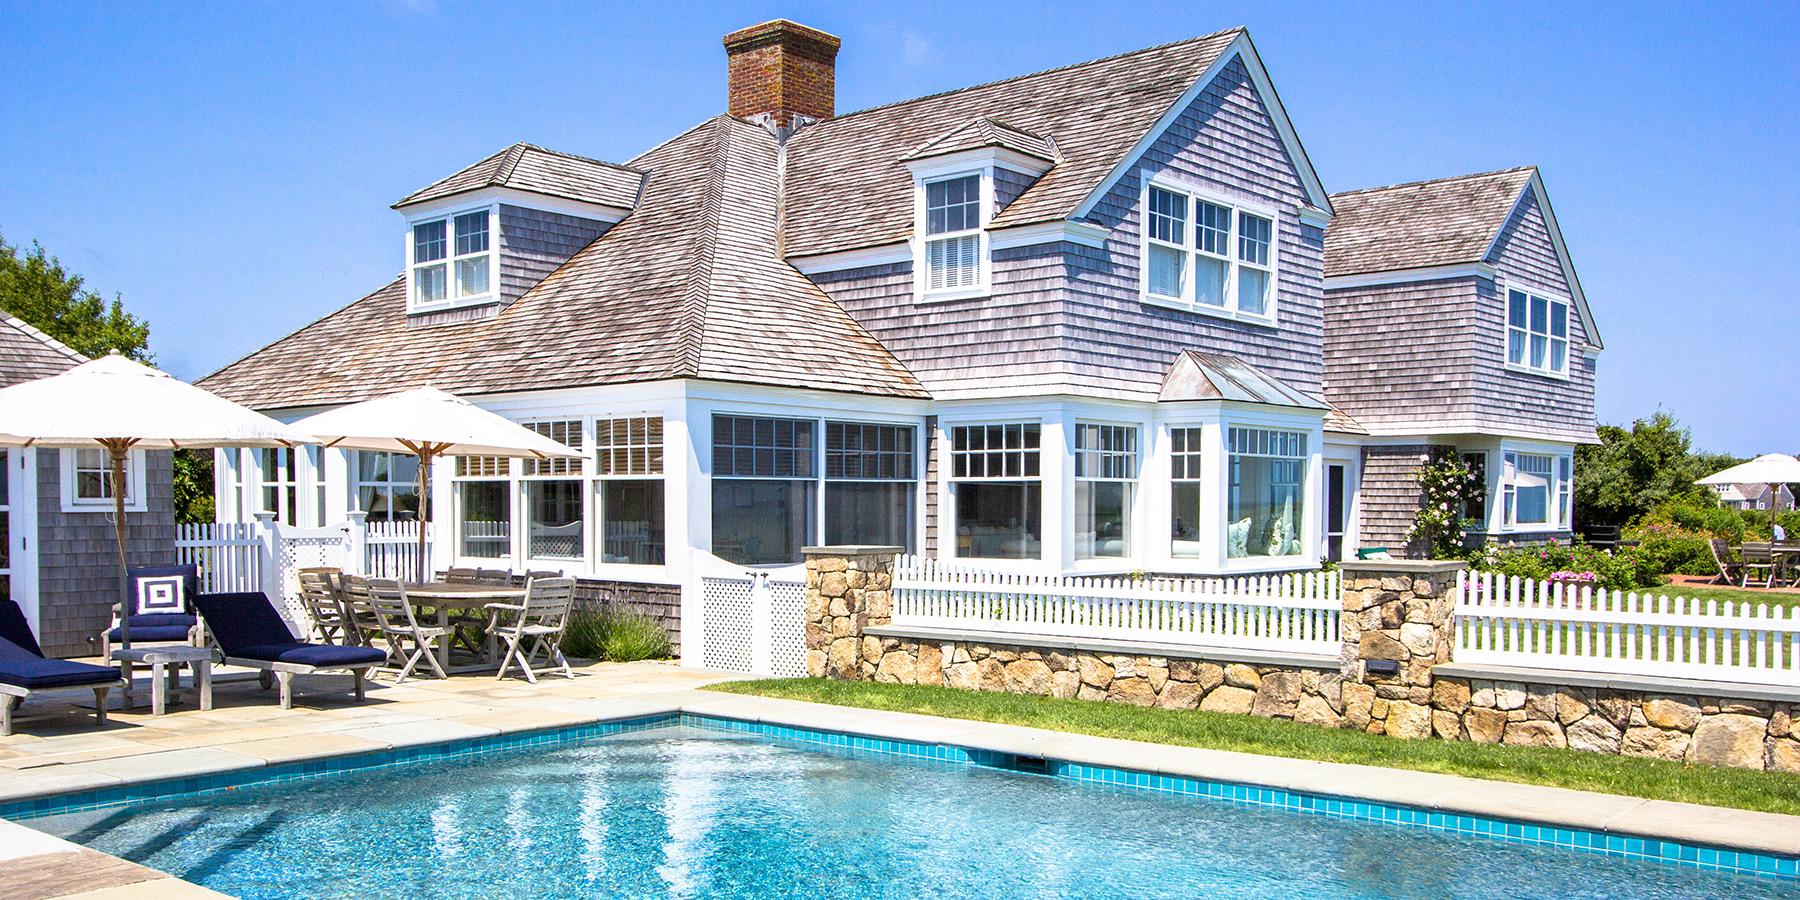 Martha's Vineyard Vacation Rentals And Real Estate